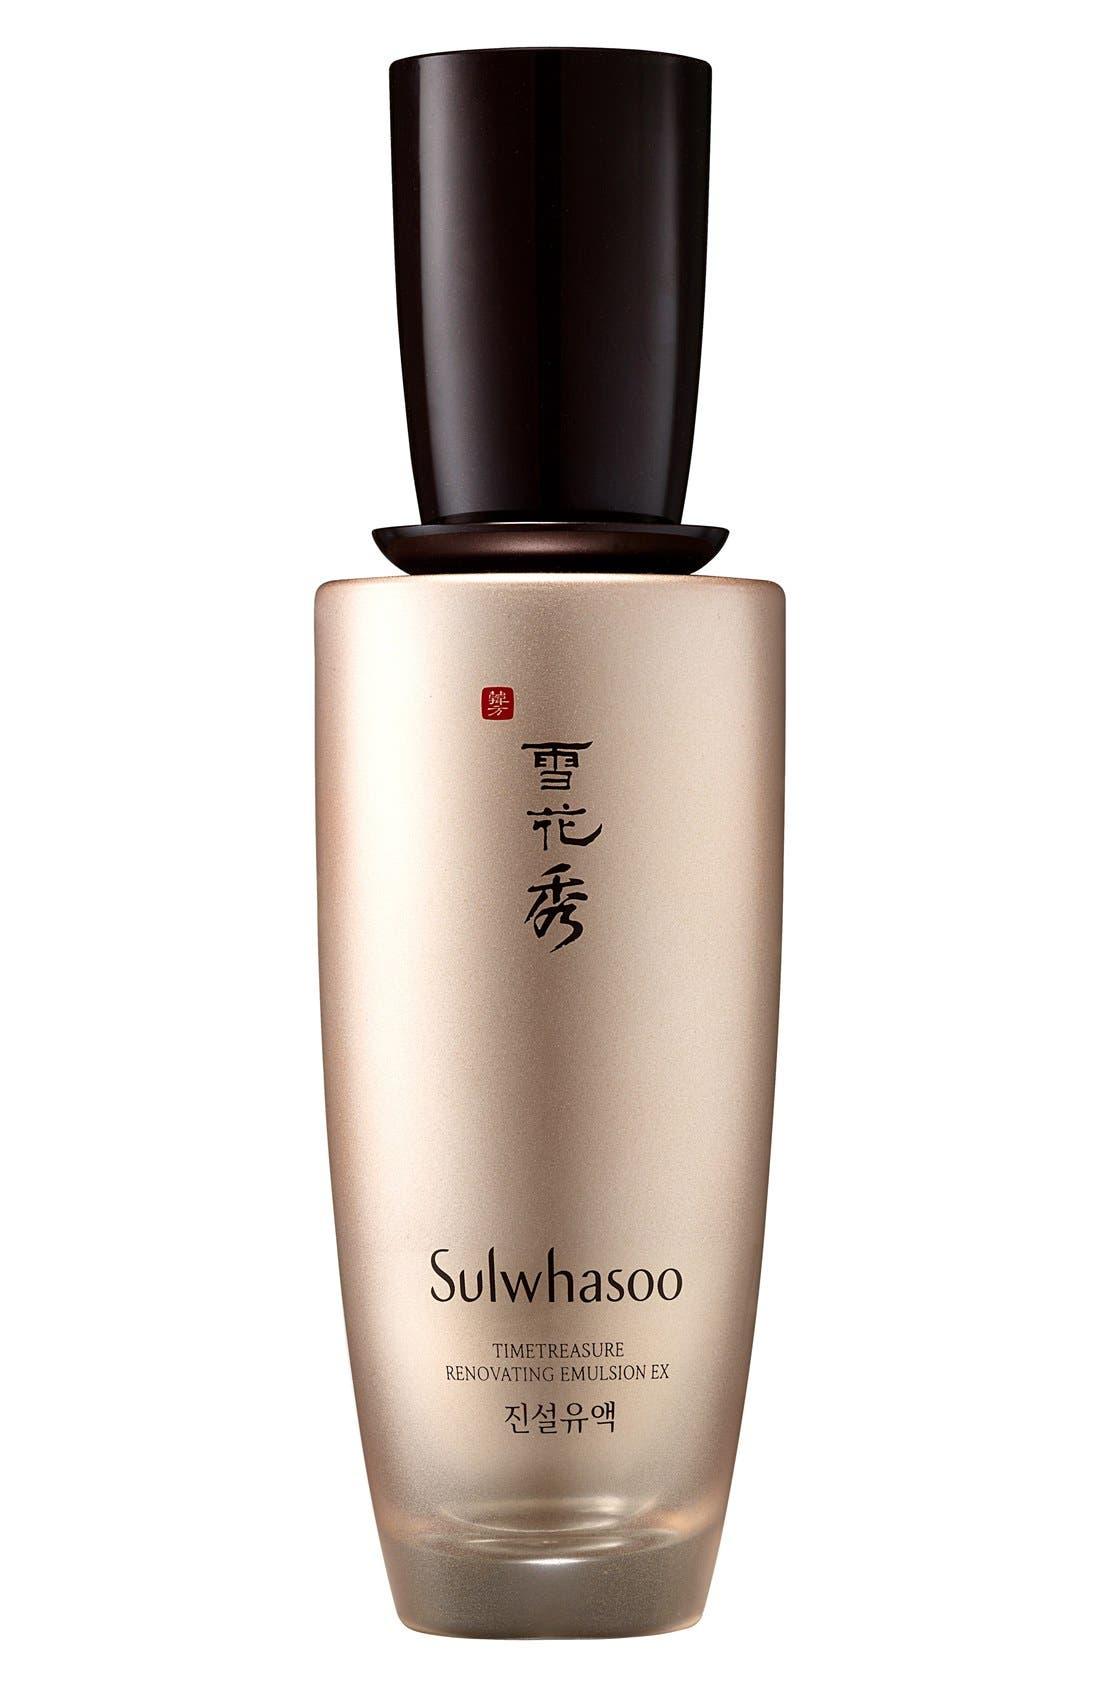 Sulwhasoo 'Timetreasure' Renovating Emulsion EX